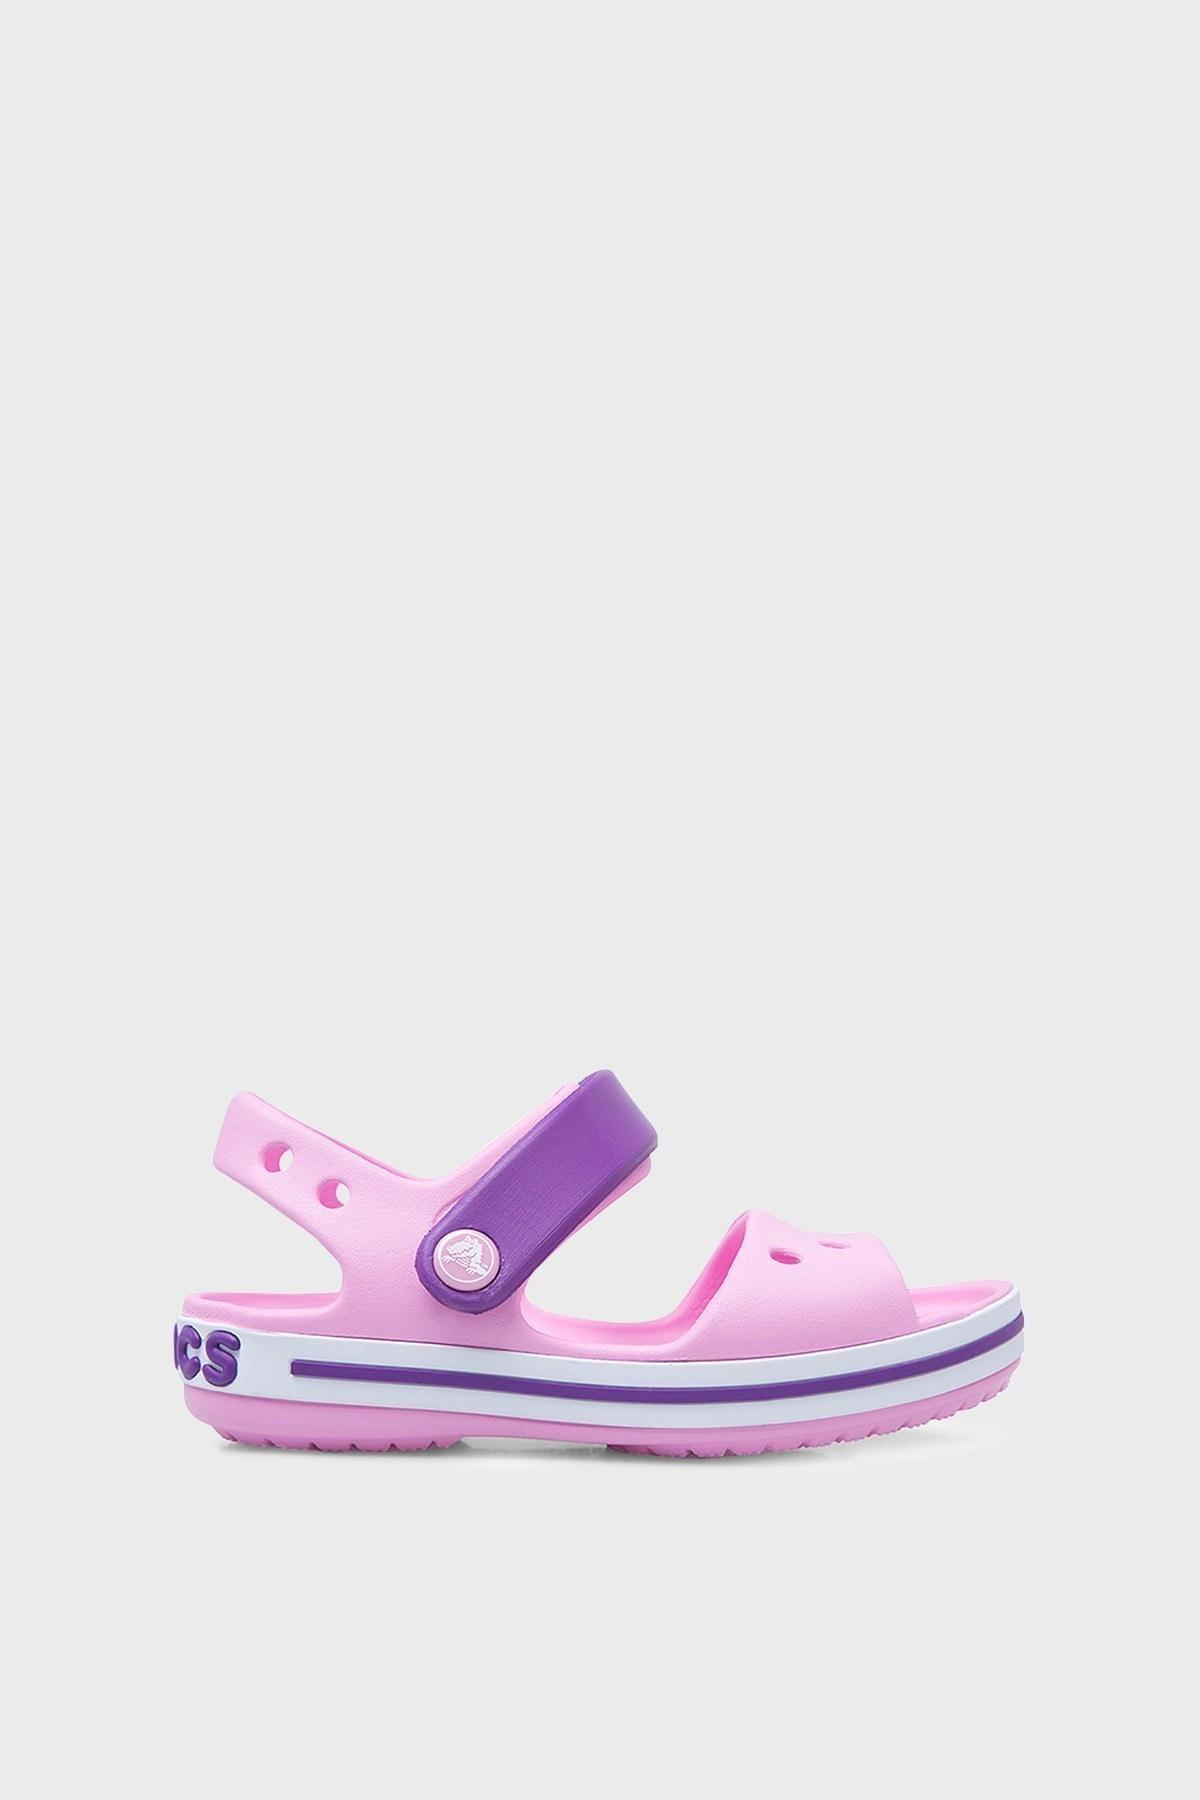 Crocs Crocband Çocuk Sandalet 12856-6AI PEMBE